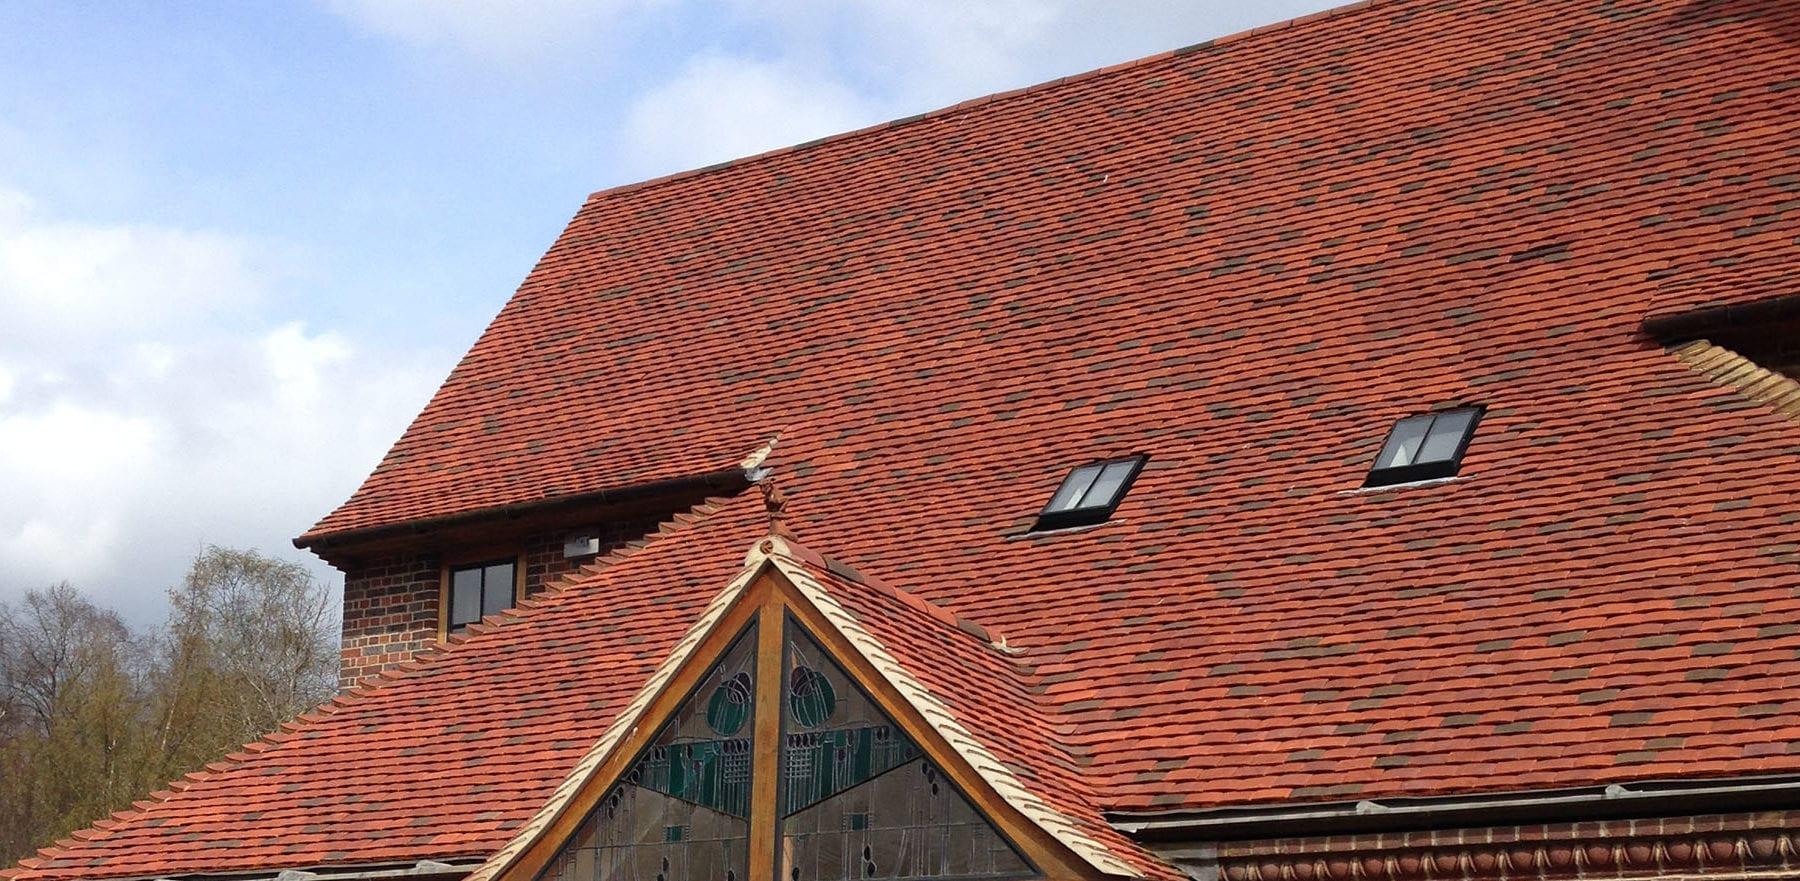 Lifestiles - Handmade Bespoke Clay Roof Tiles - Chipstead, England 4